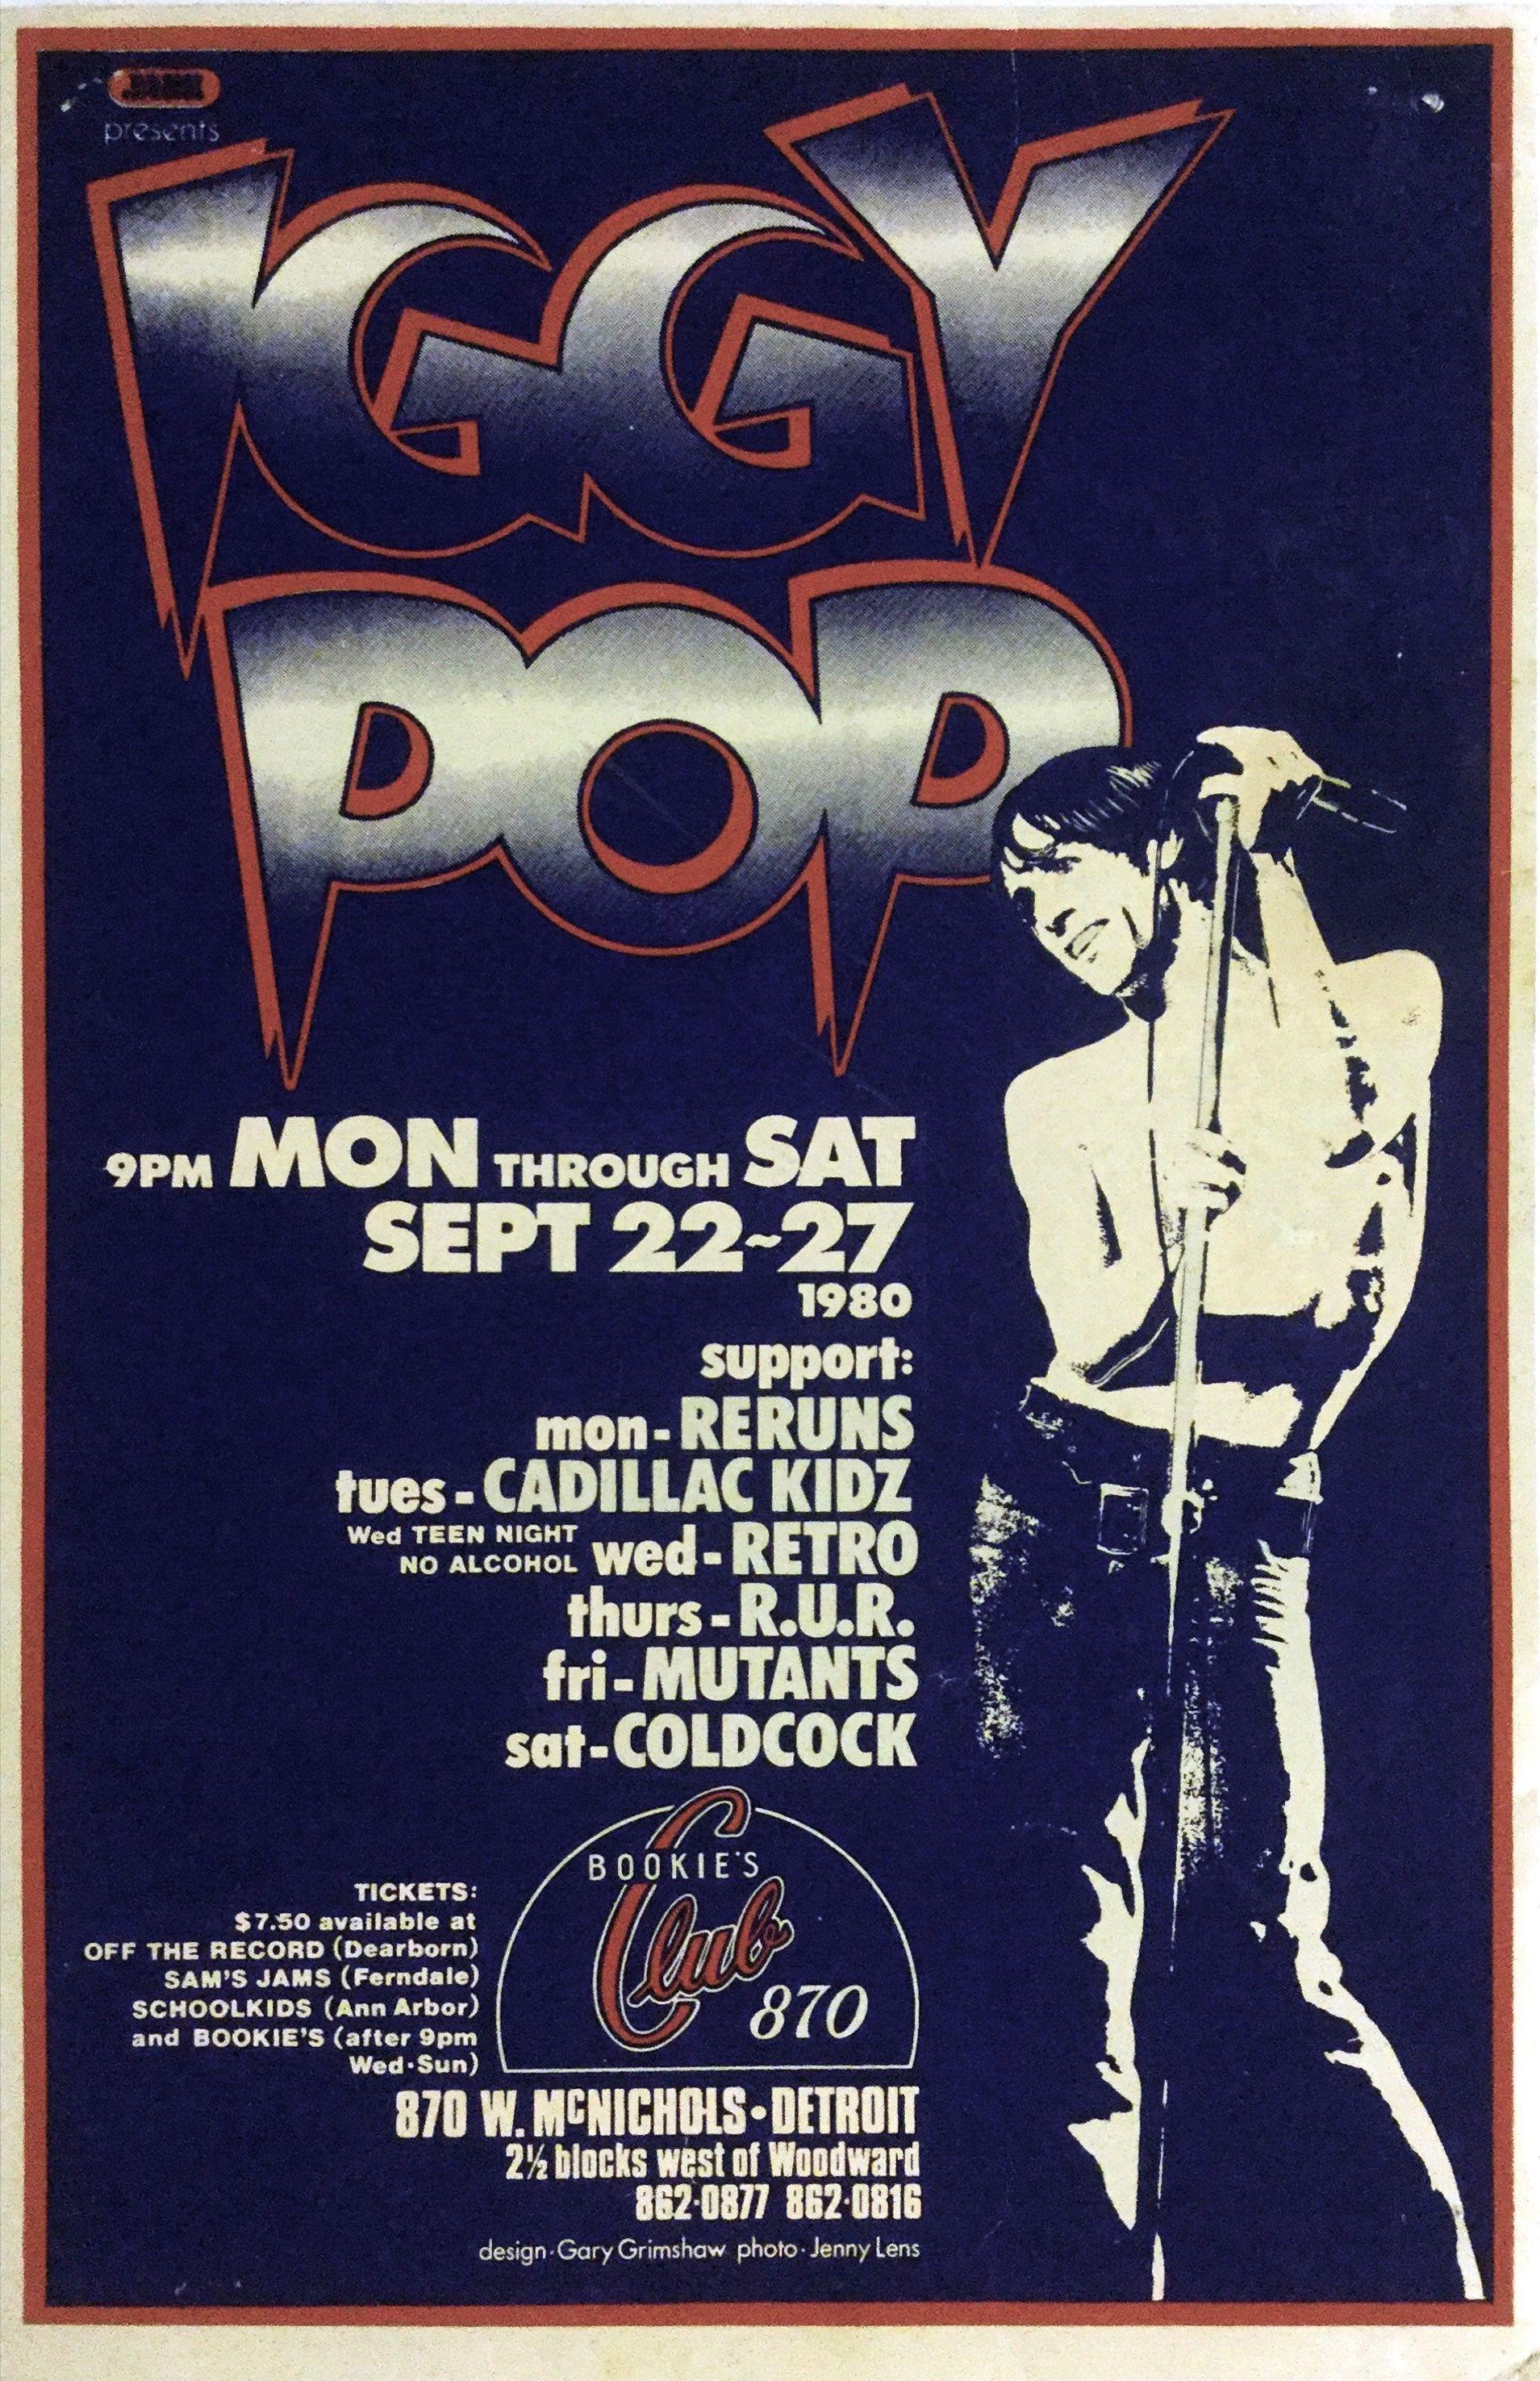 Iggy Pop 1980 First Printing Bookie S Detroit Gary Grimshaw